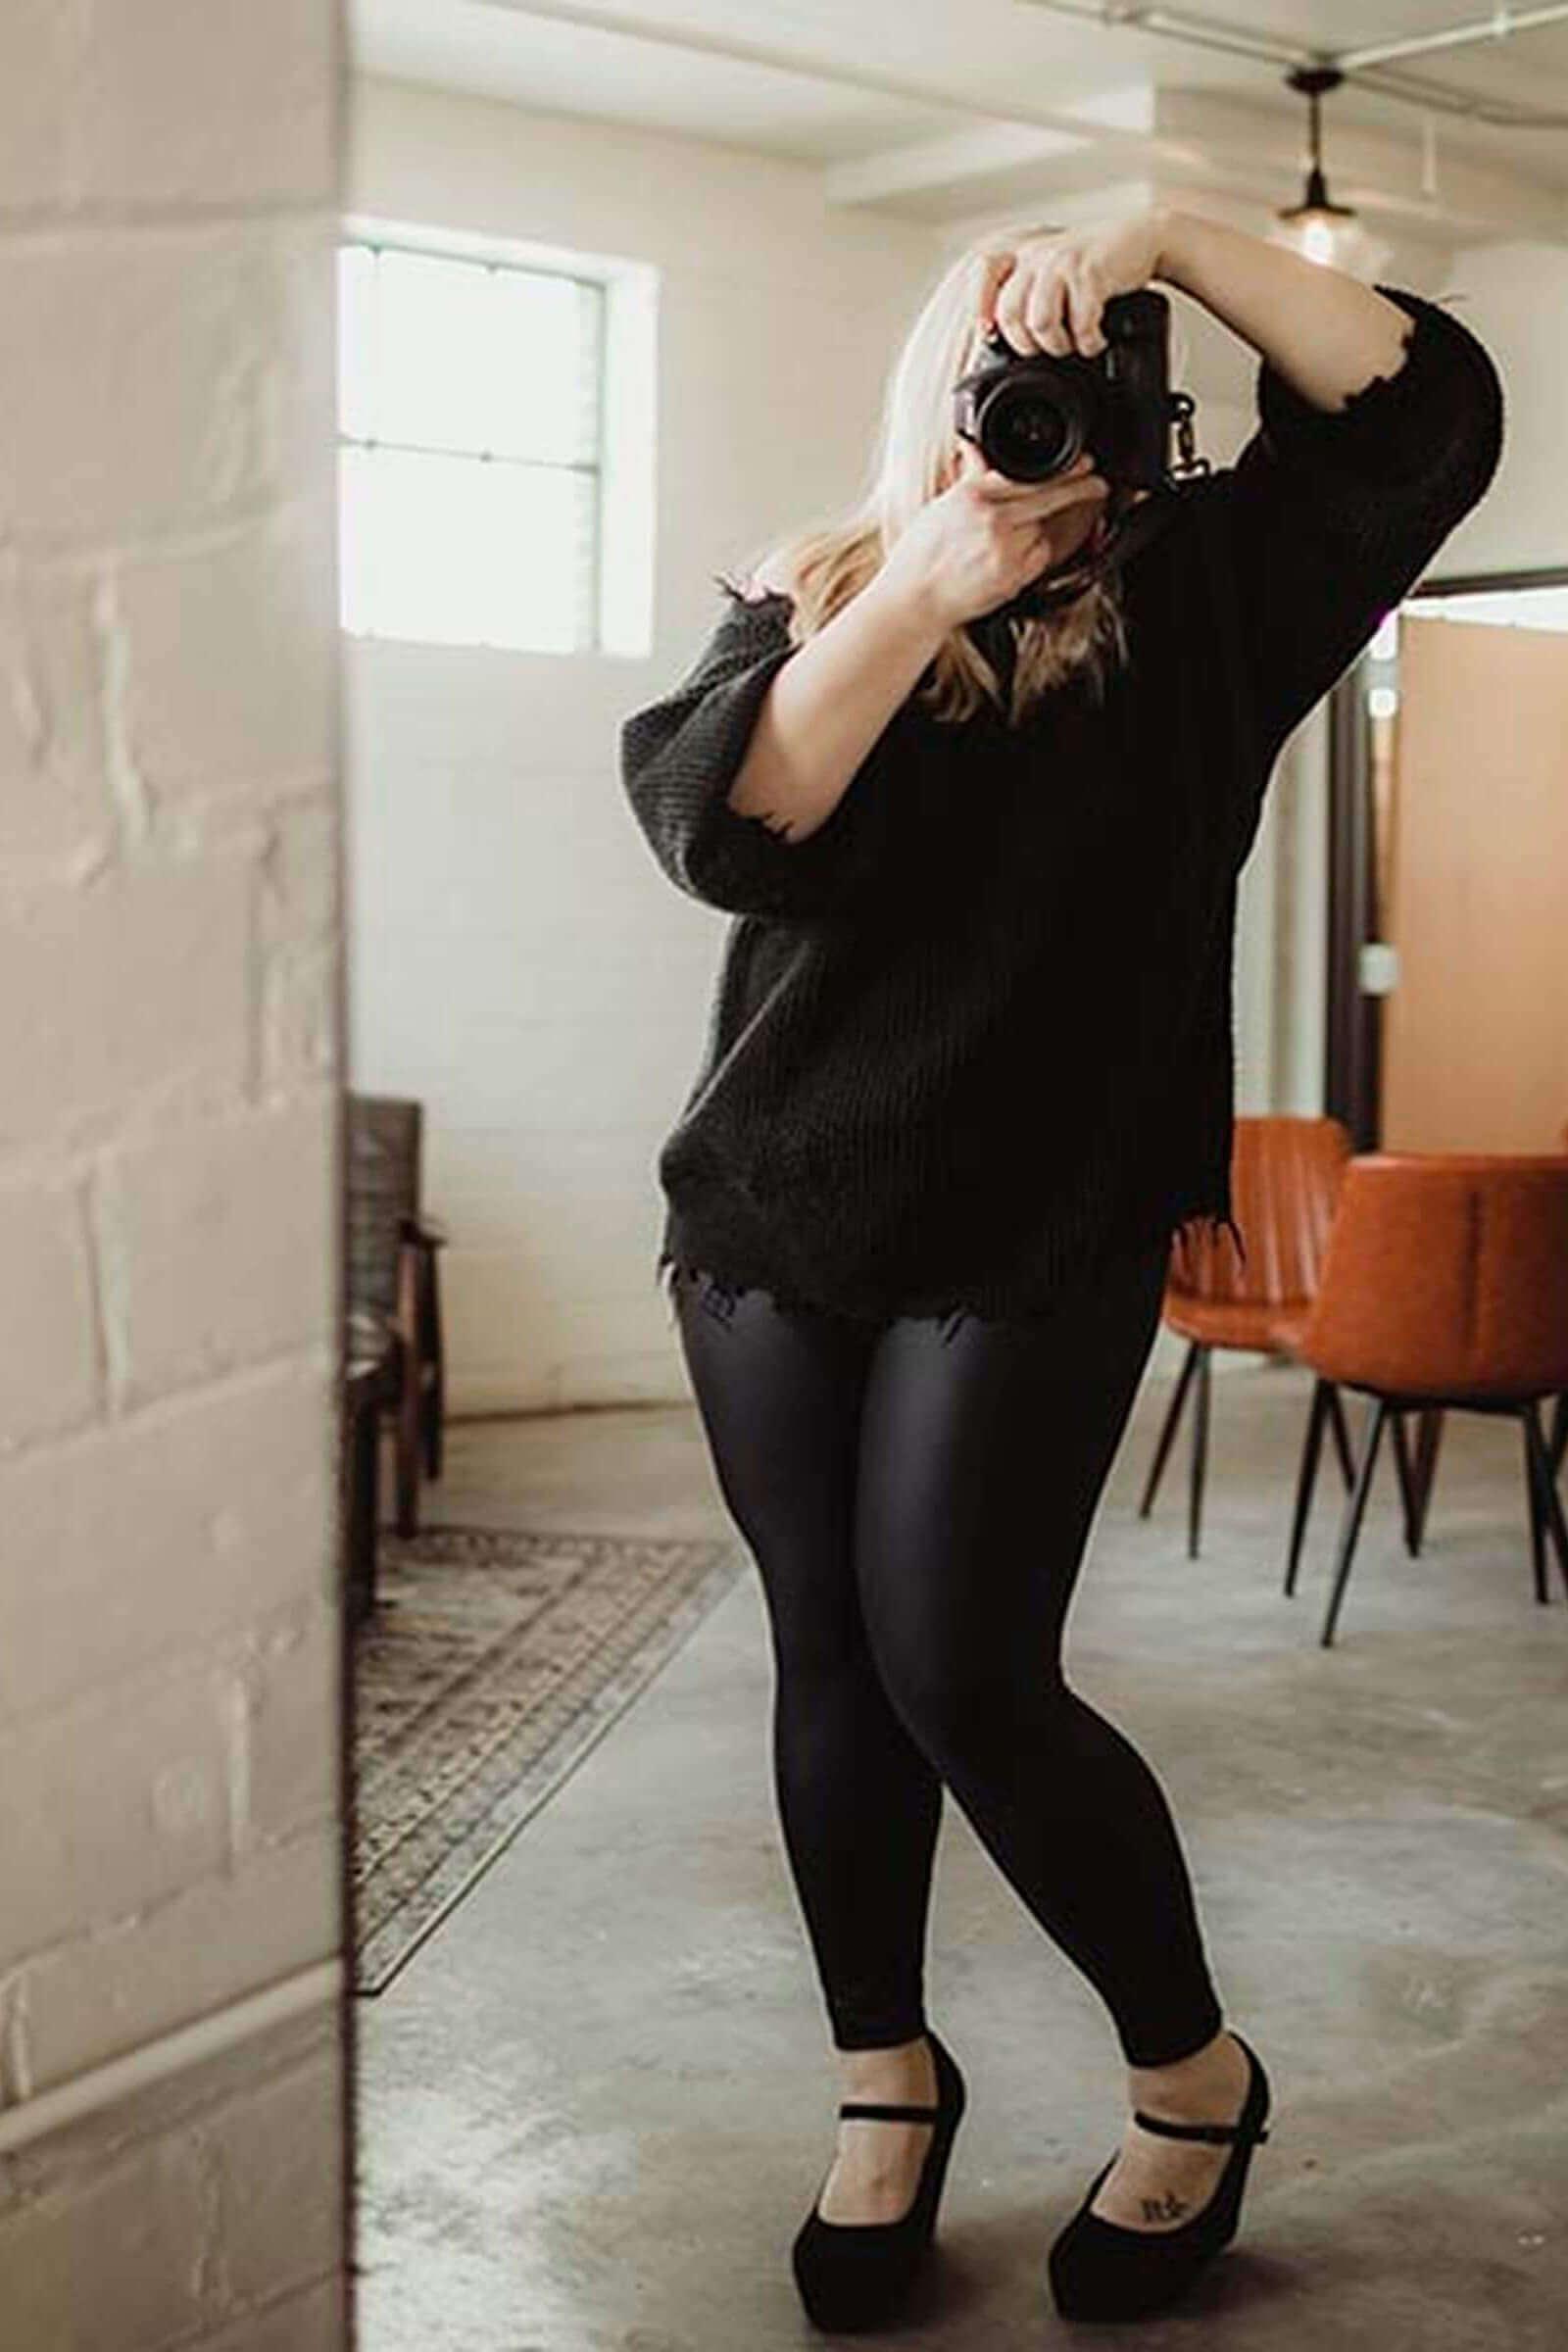 Kim Andera taking photo in mirror at wedding shoot